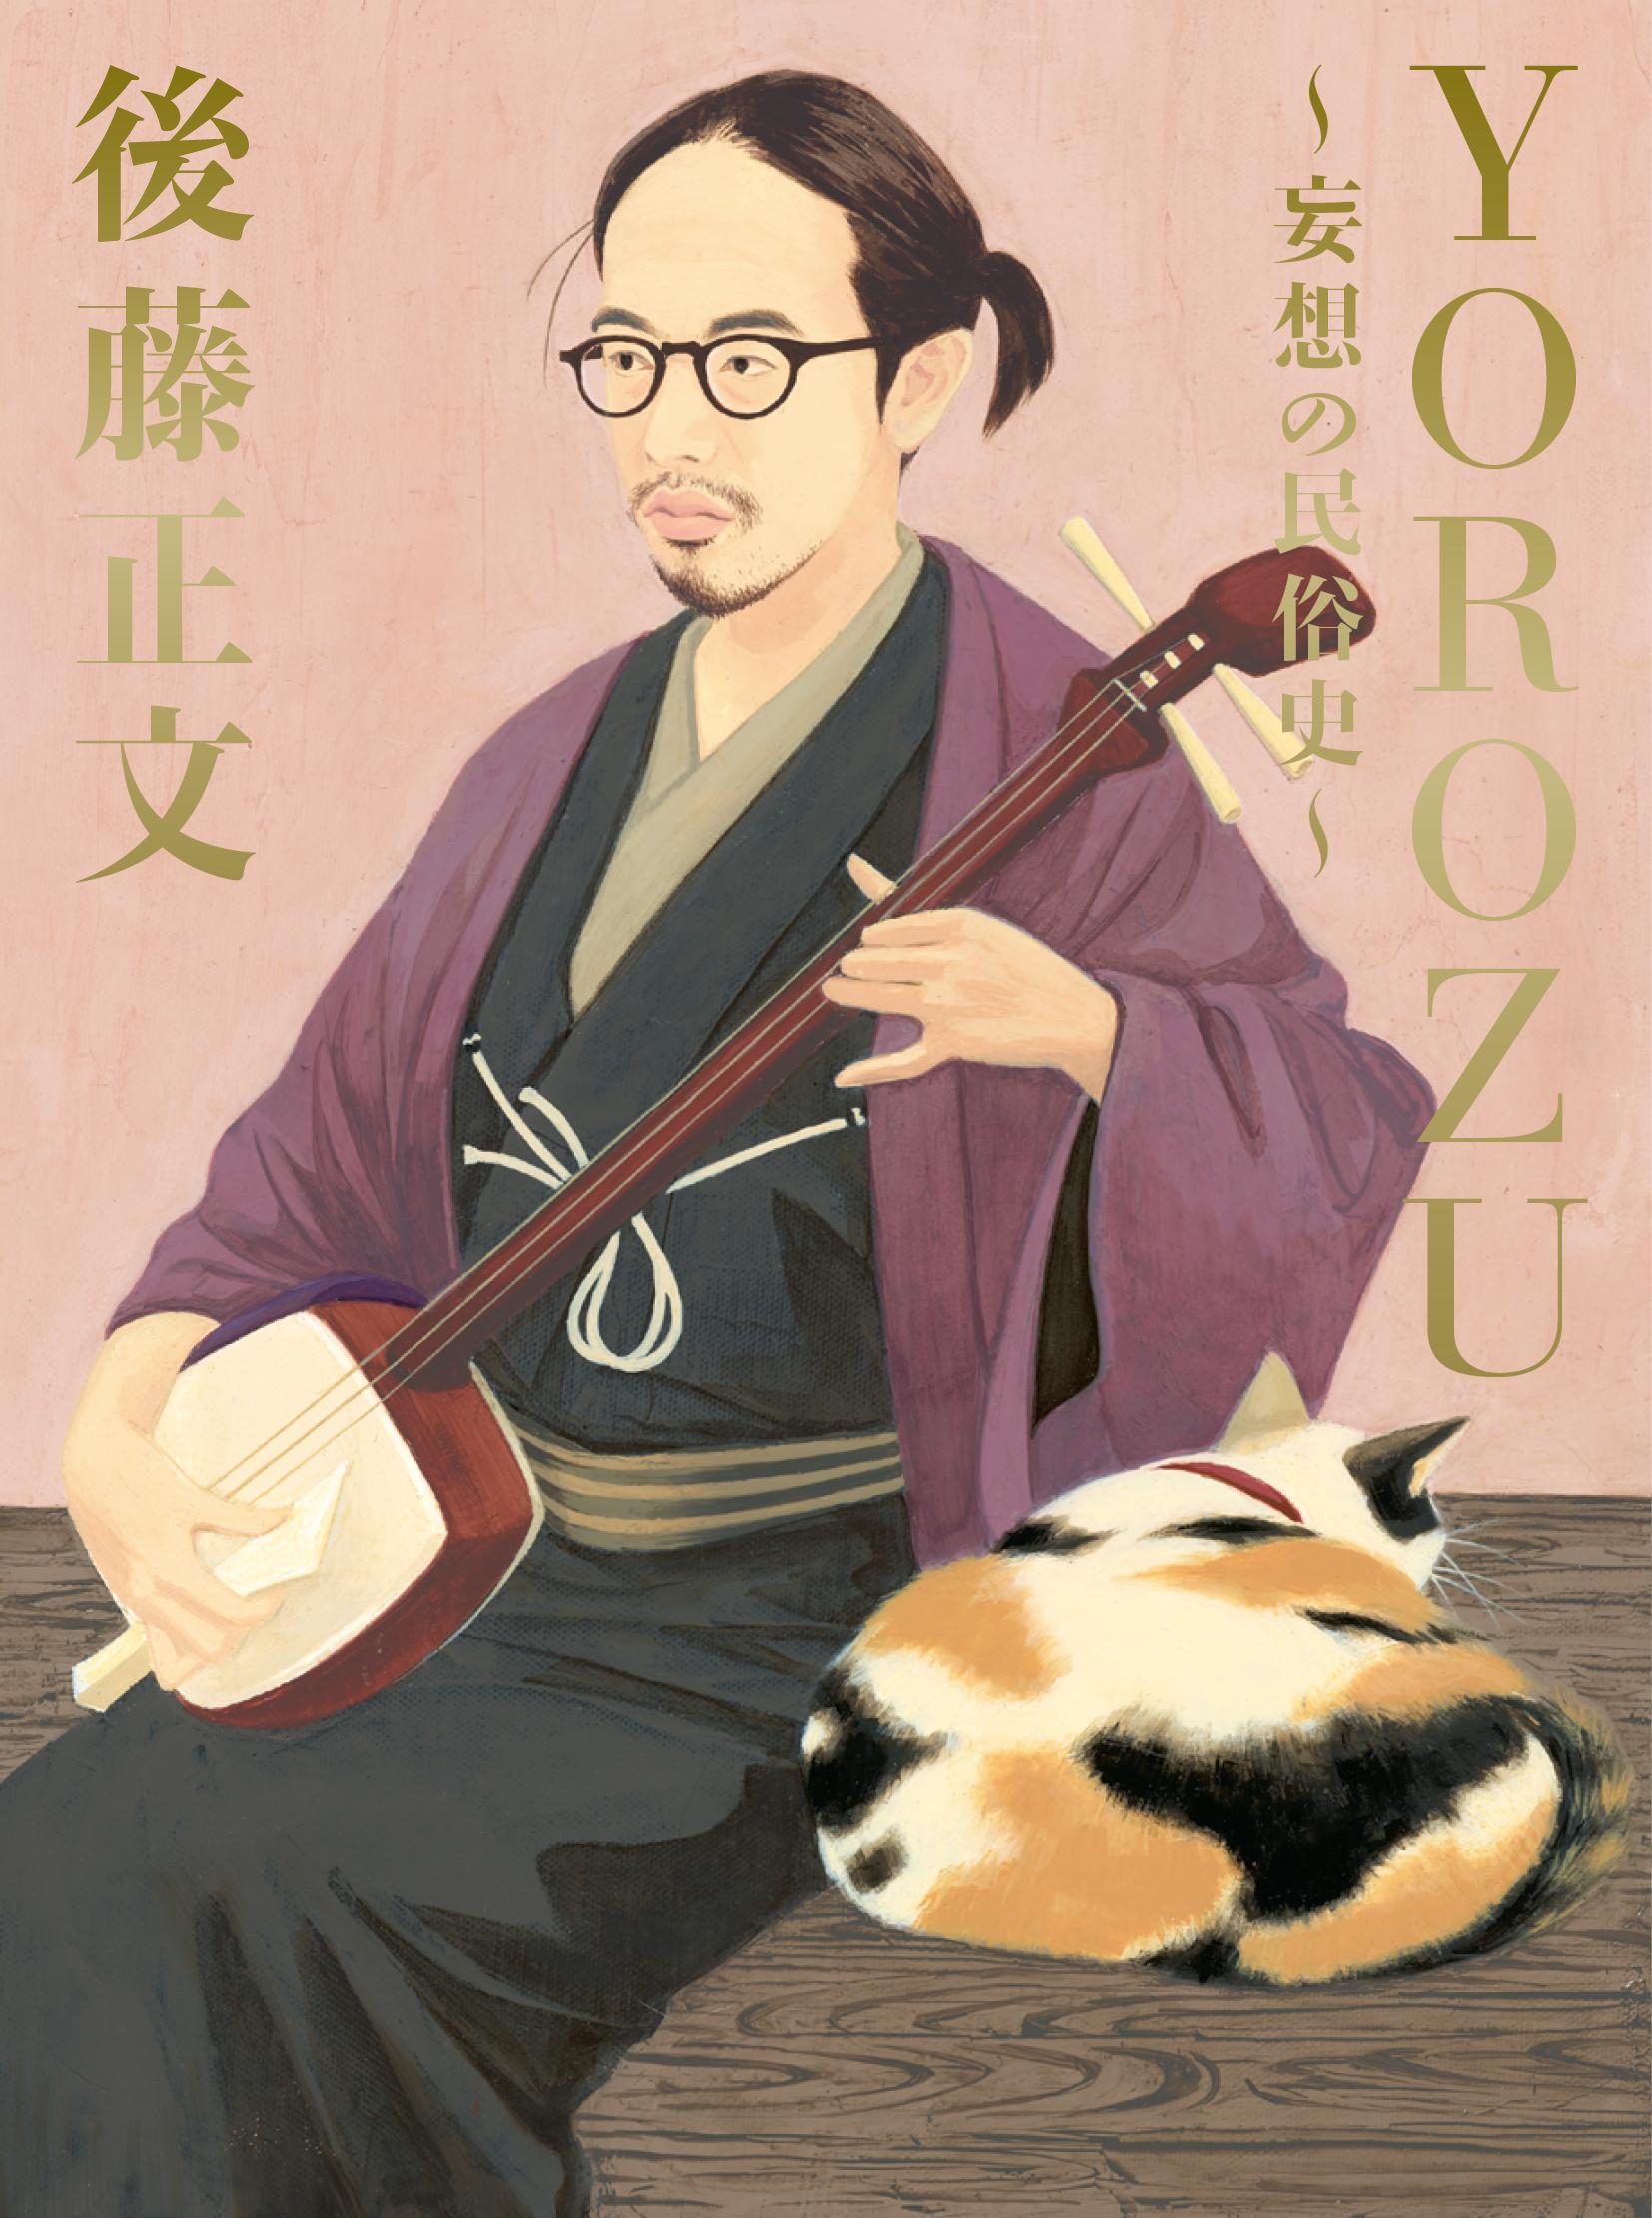 YOROZU~妄想の民俗史~ [BOOK+CD]